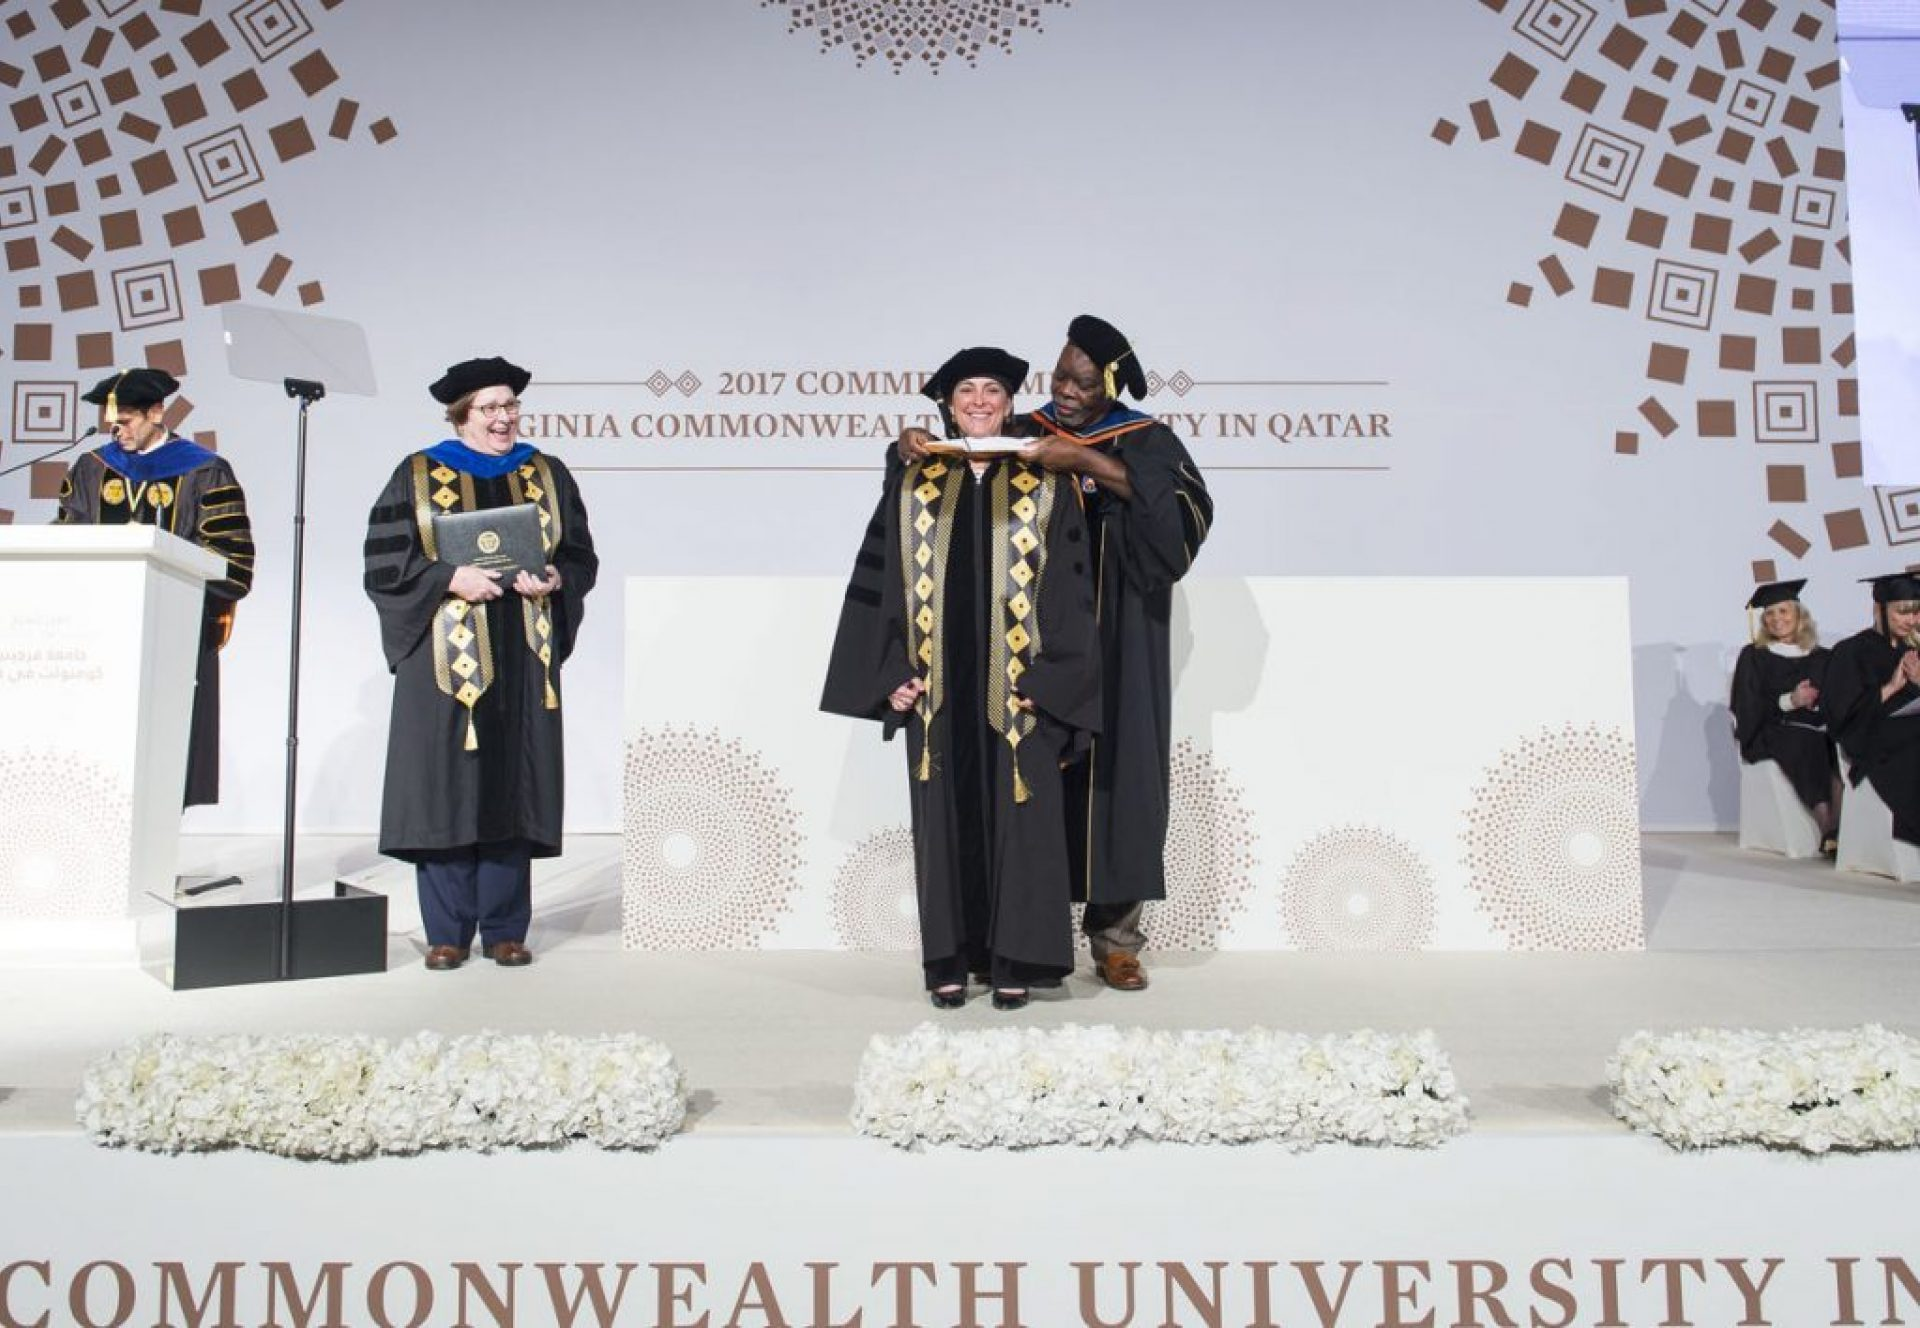 VCU Qatar Slider